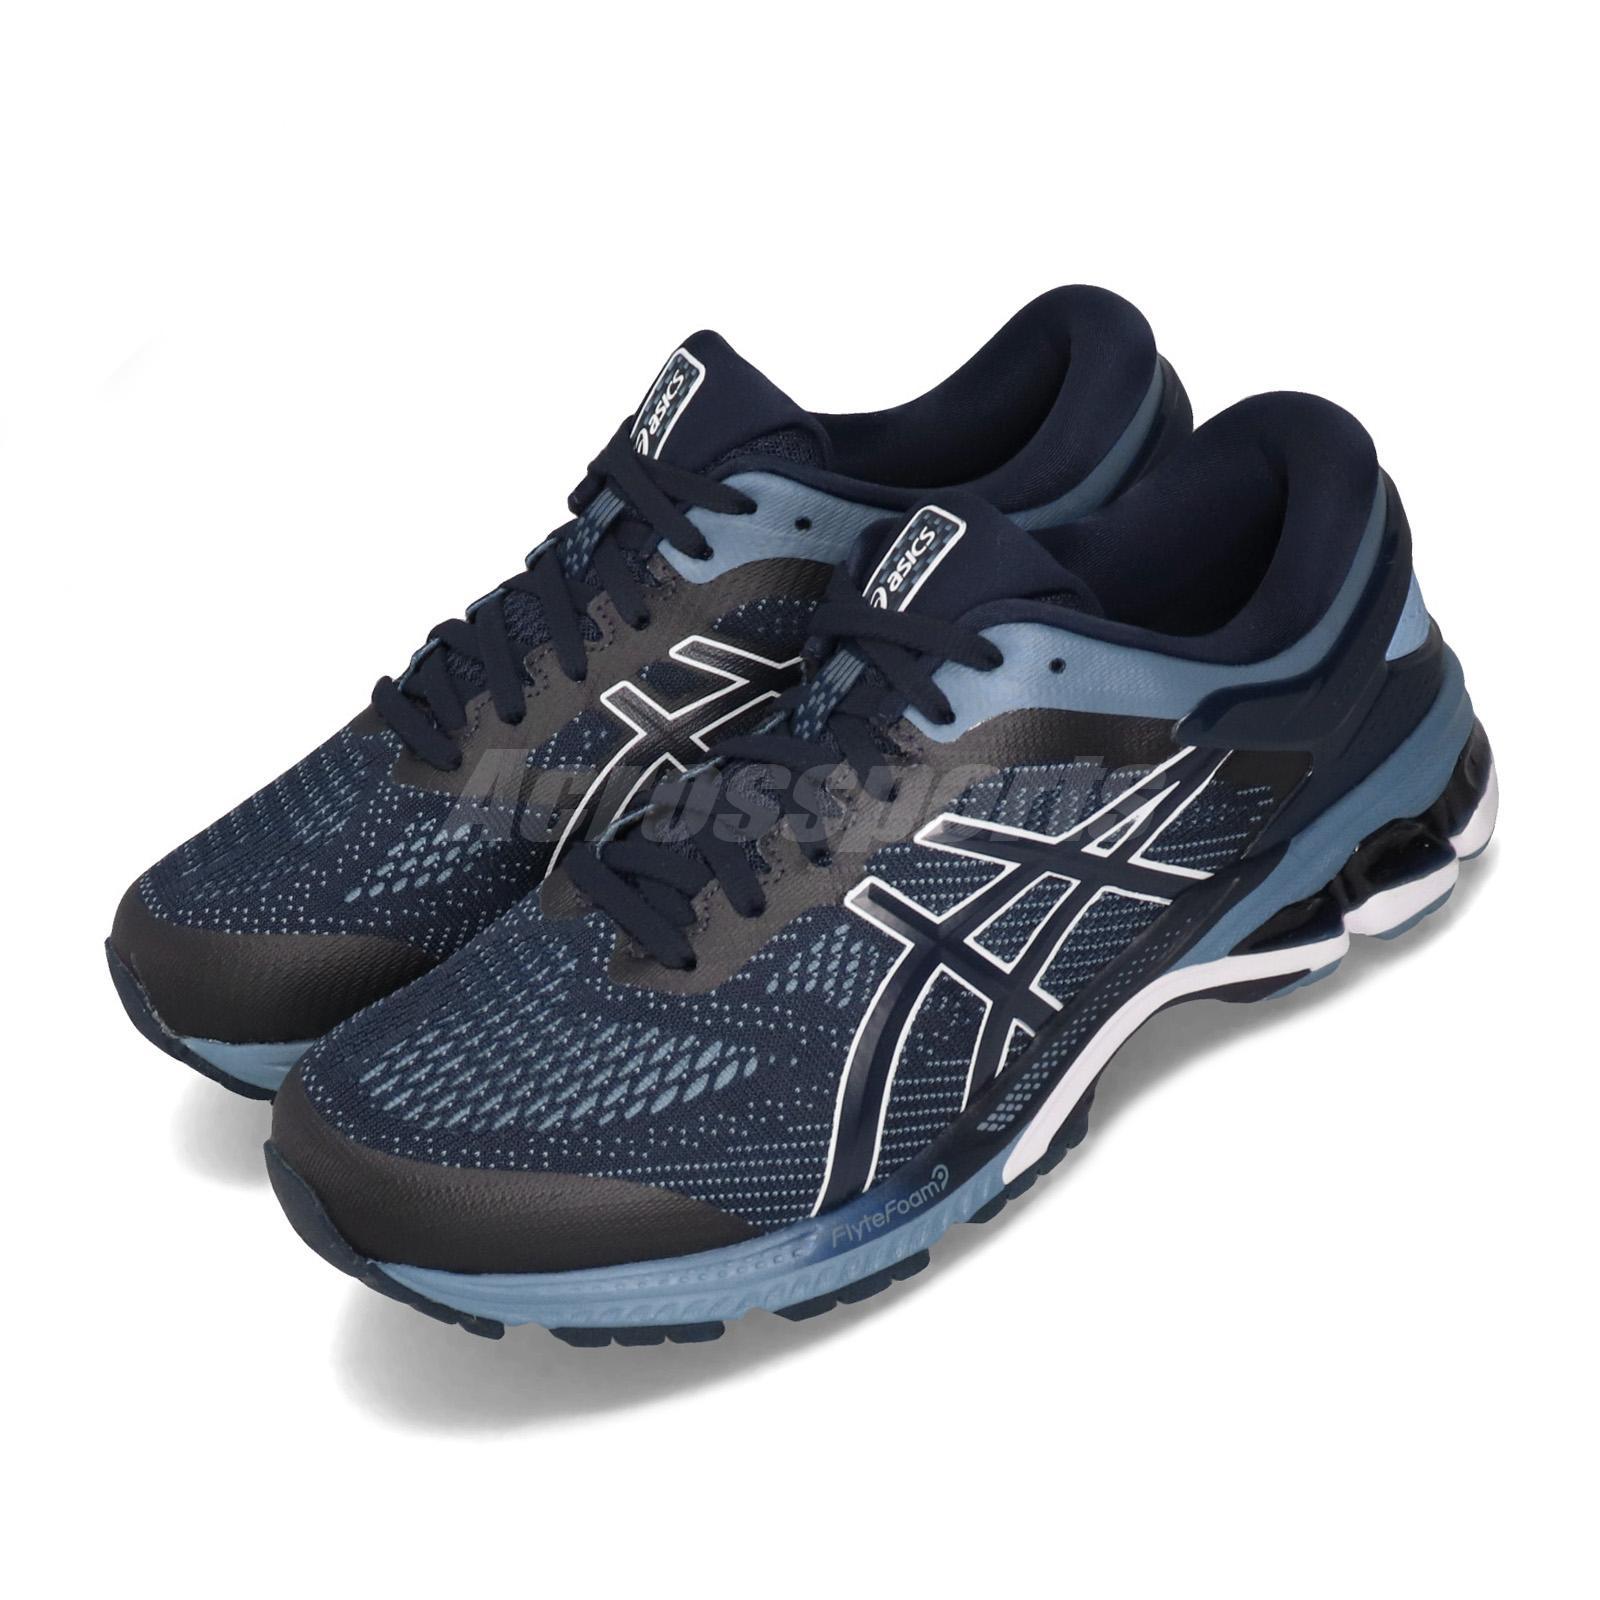 asics tennis shoes mens wide